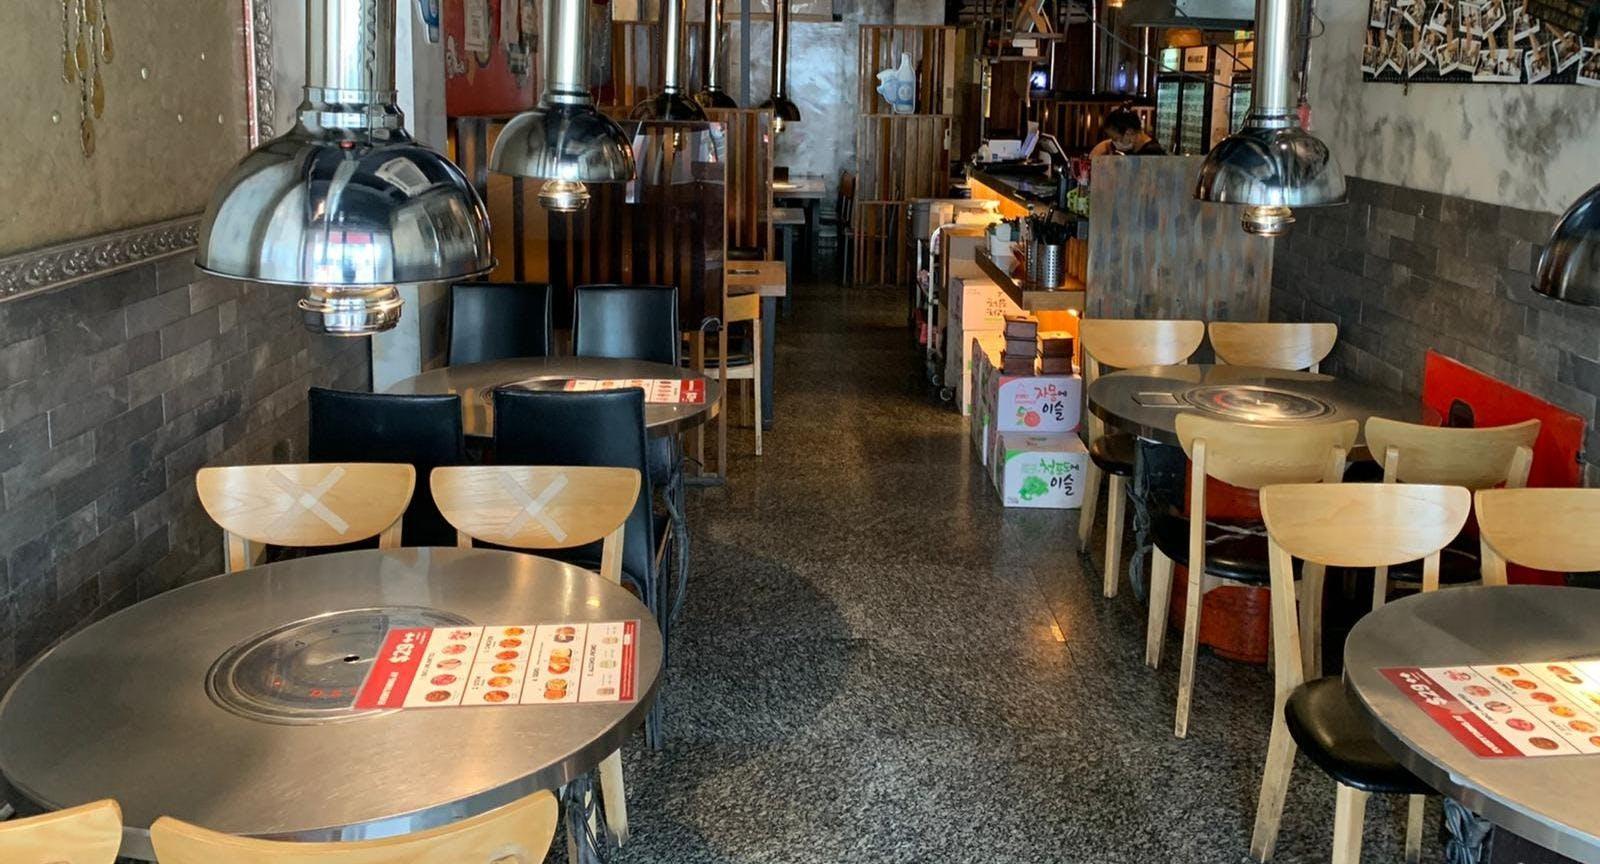 Photo of restaurant Sin Manbok 신만복 - Tanjong Pagar in Tanjong Pagar, Singapore